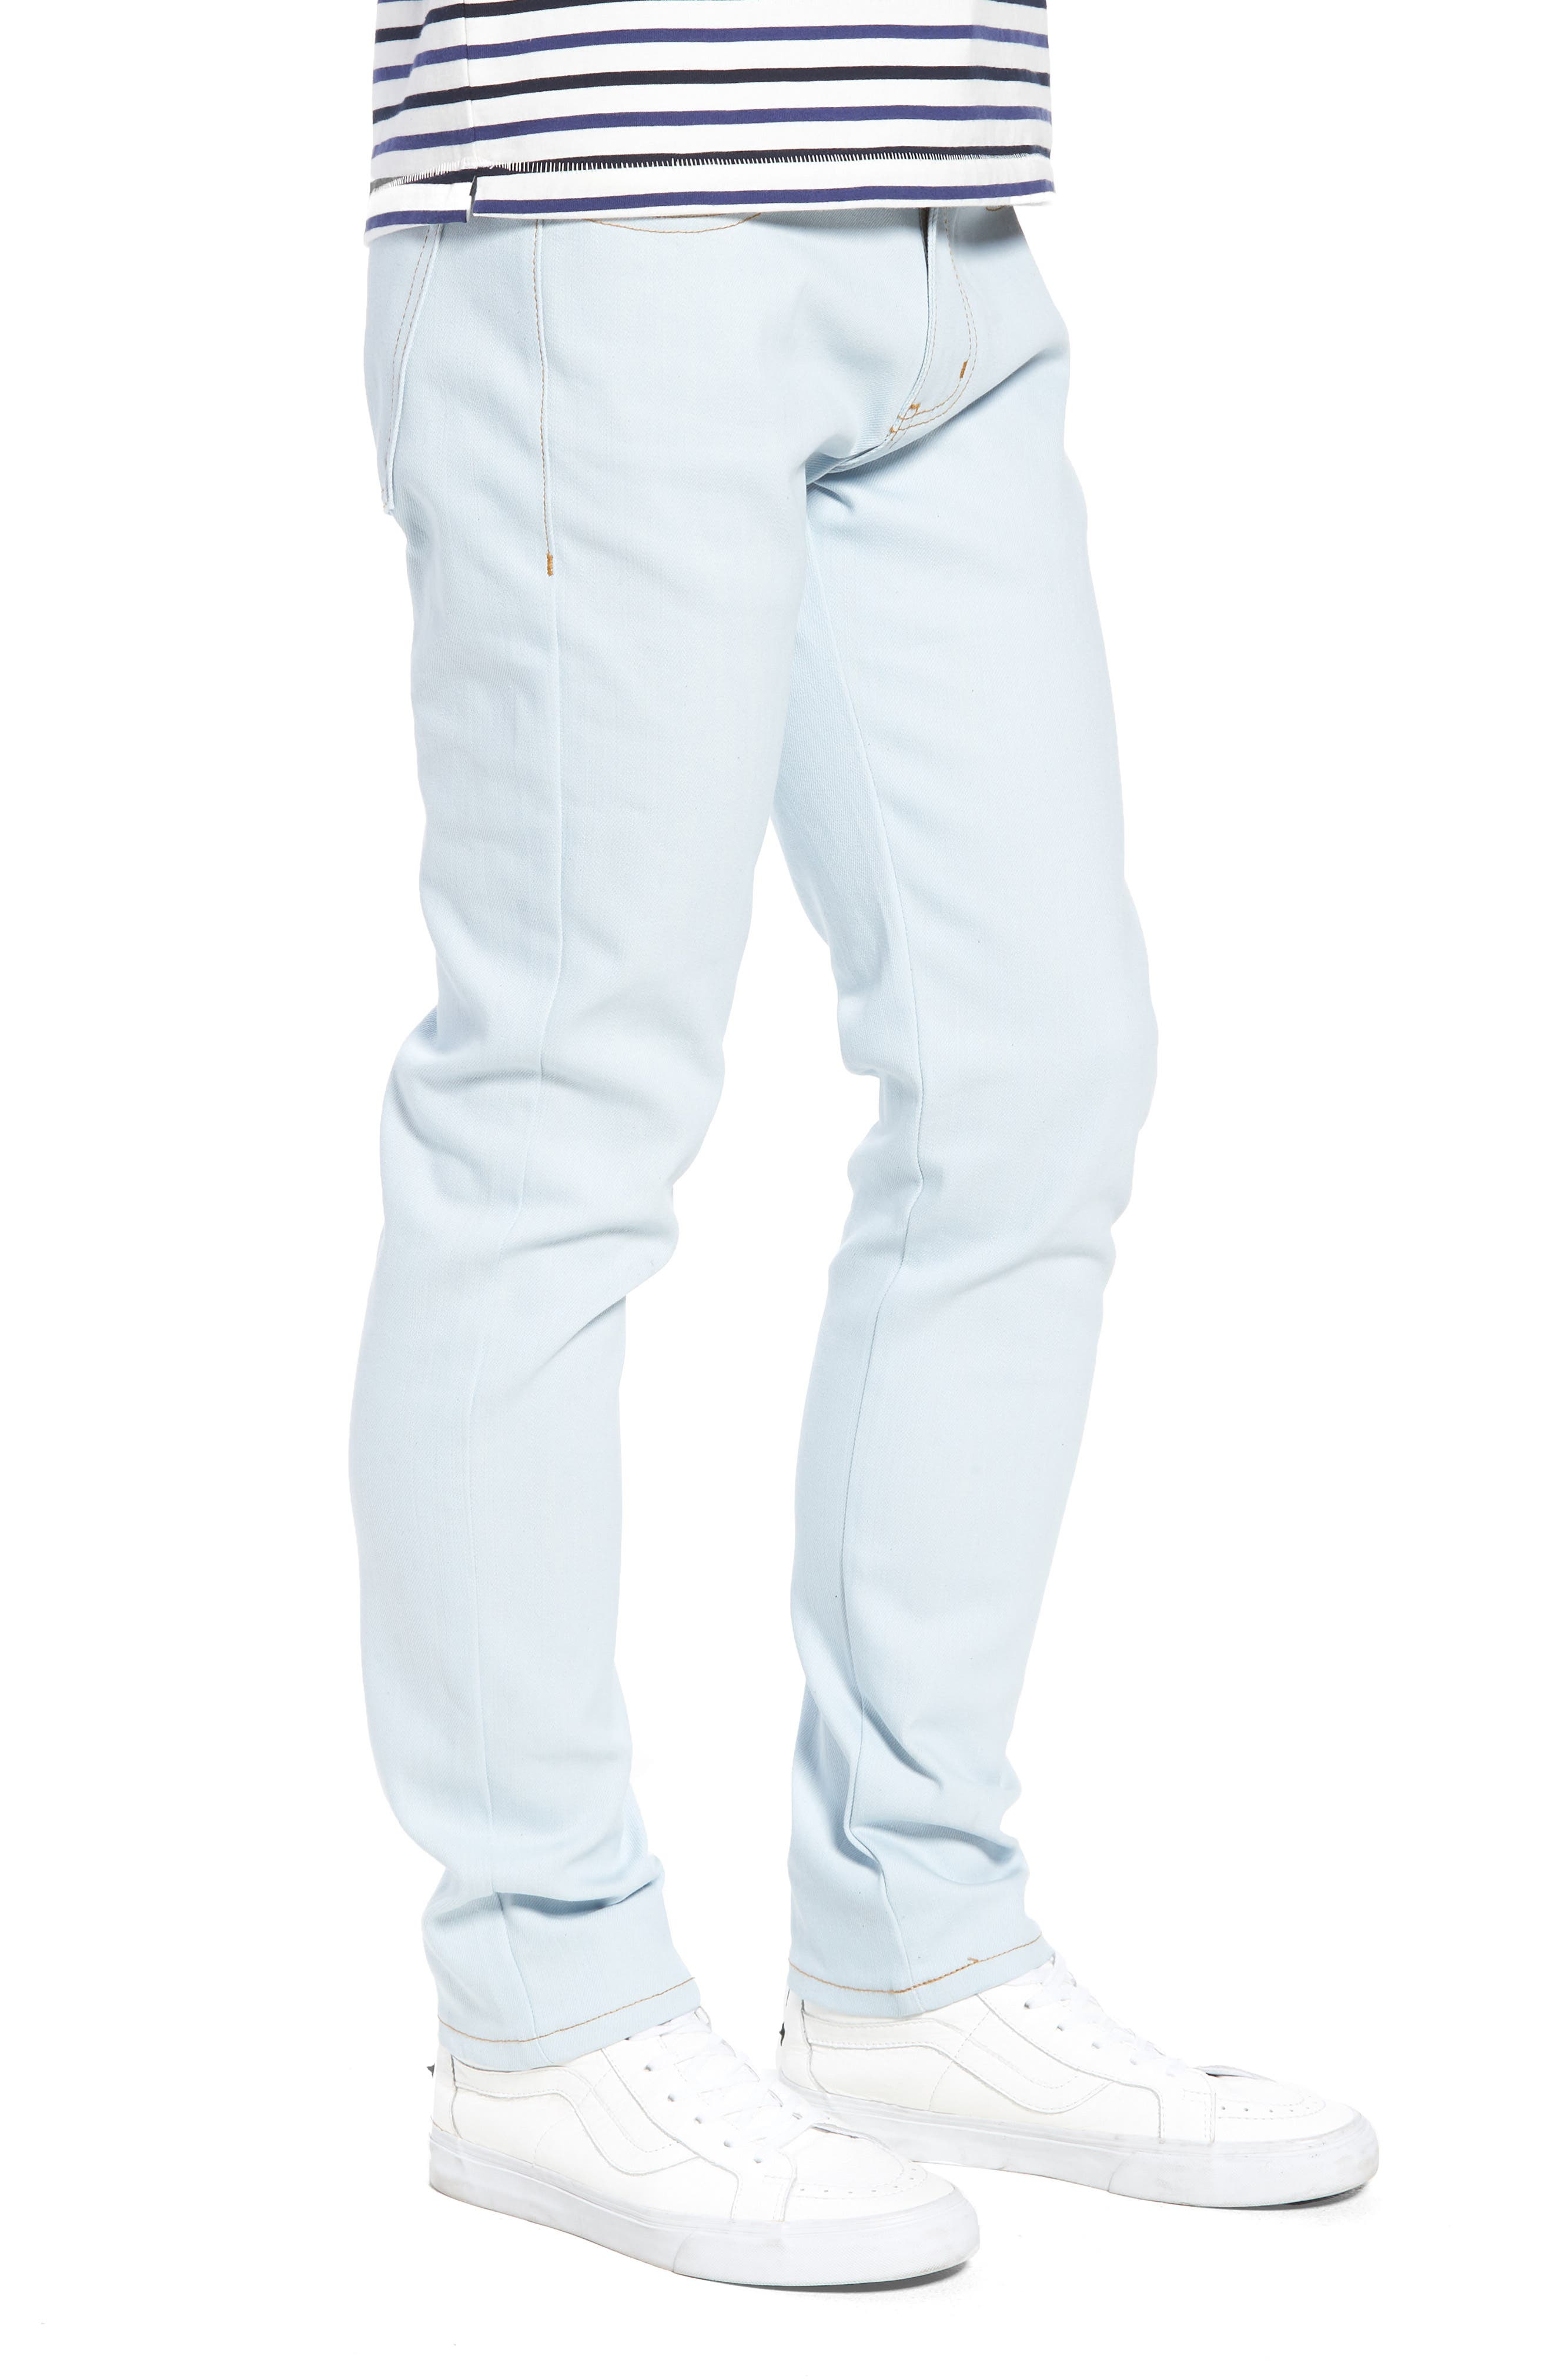 Naked & Famous Super Skinny Guy Skinny Fit Jeans,                             Alternate thumbnail 3, color,                             Powder Blue